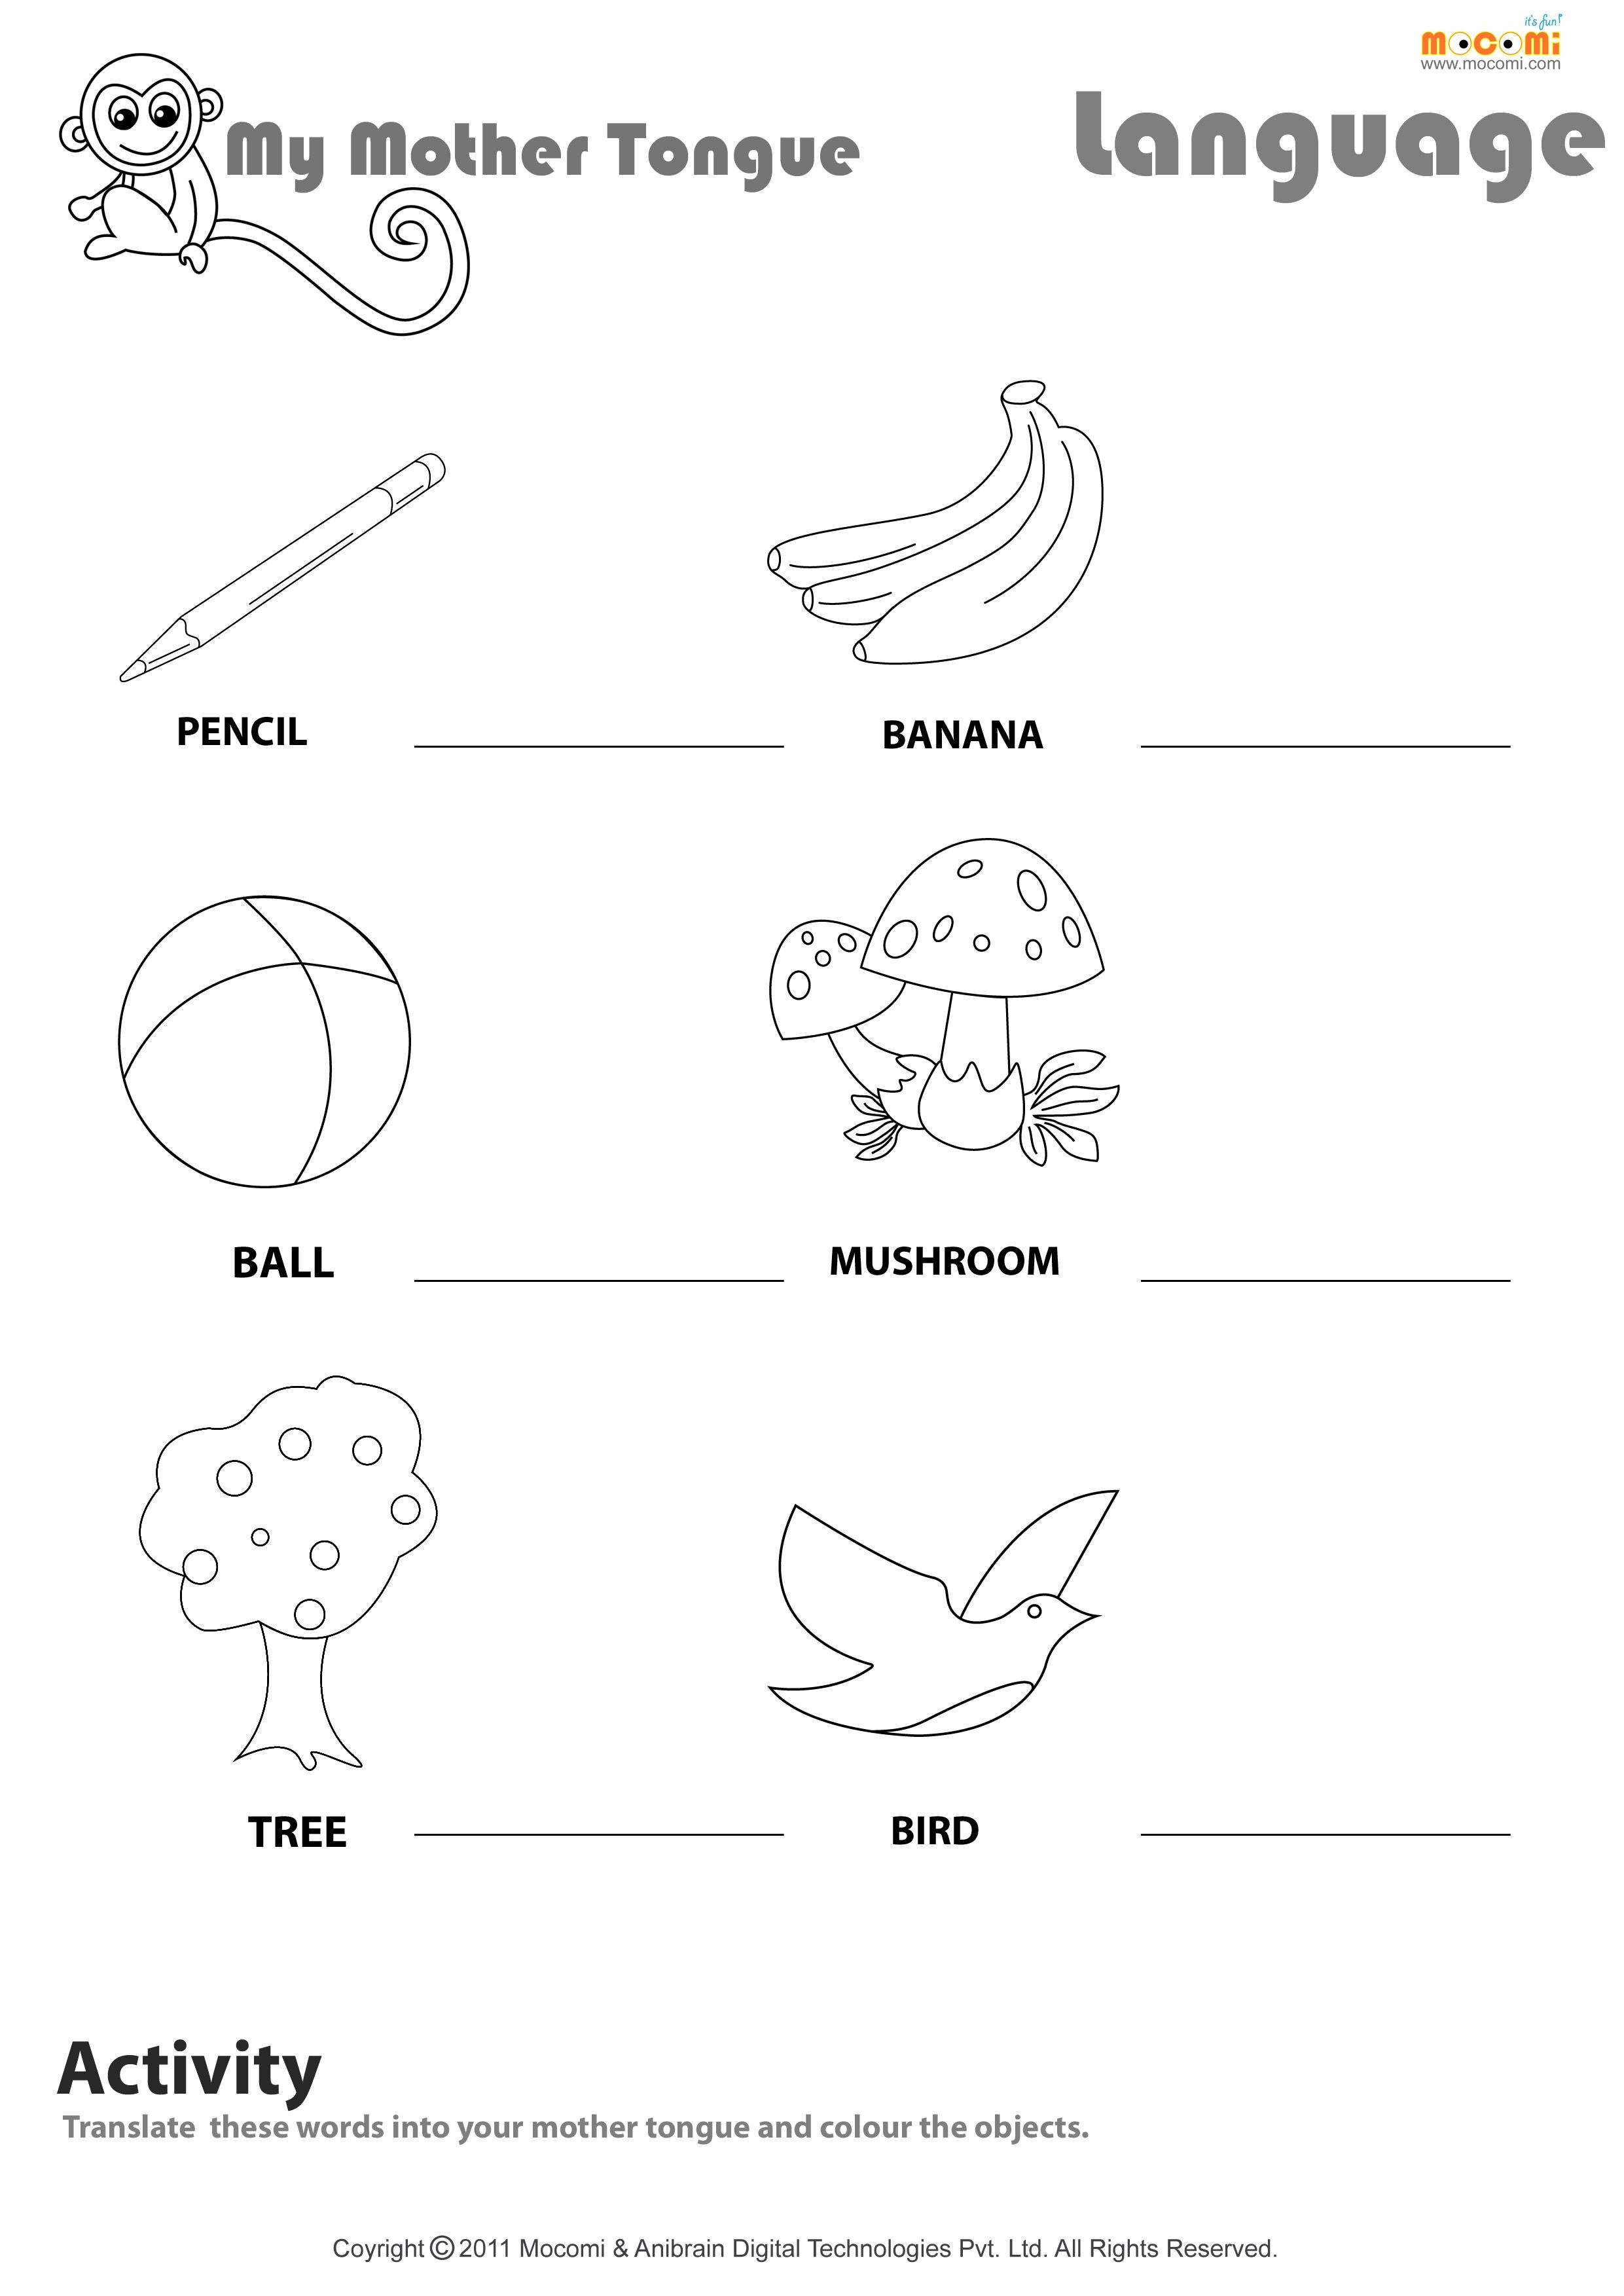 My mother tongue - English Worksheet for Kids   Mocomi   Fun worksheets for  kids [ 3507 x 2481 Pixel ]